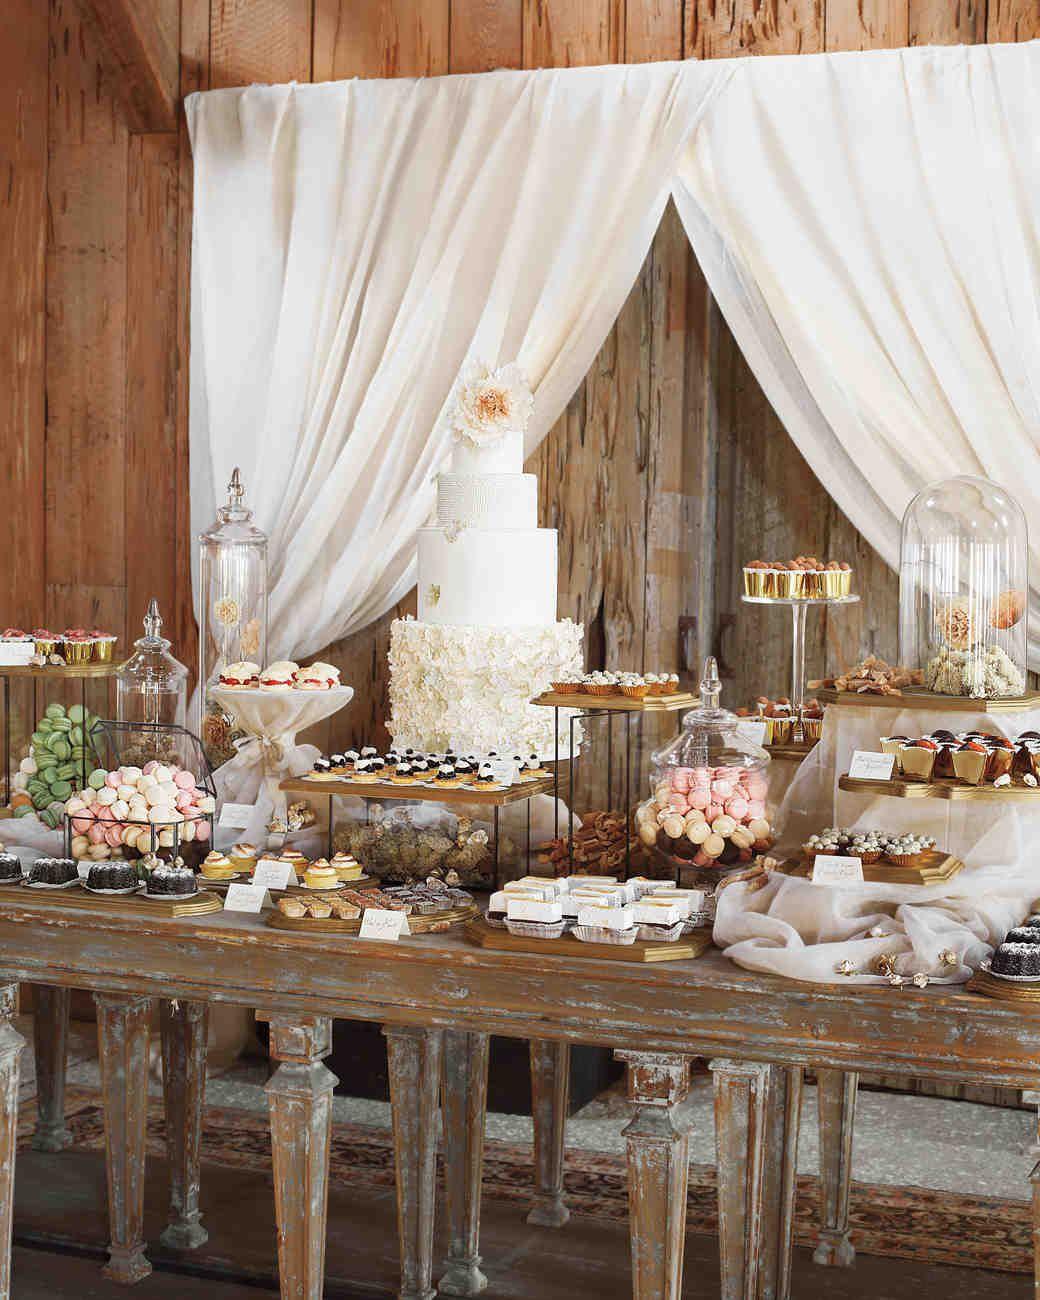 Image Result For Candy Table Display Wedding Food Bev